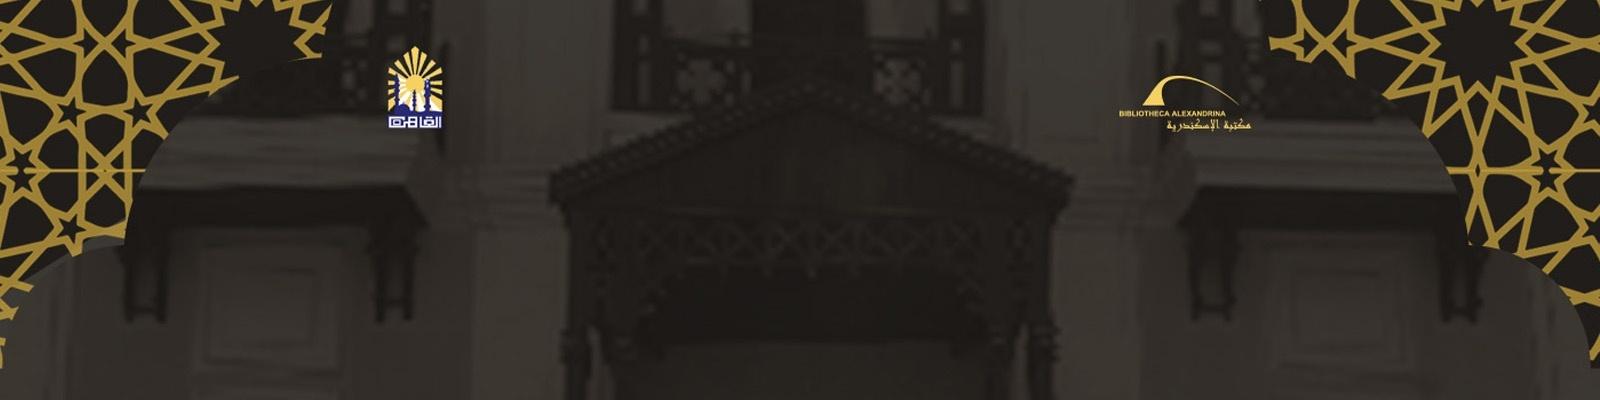 Intégration du Palais de la Princesse Khadijah aux locaux <i>extra-muros</i> de la BA